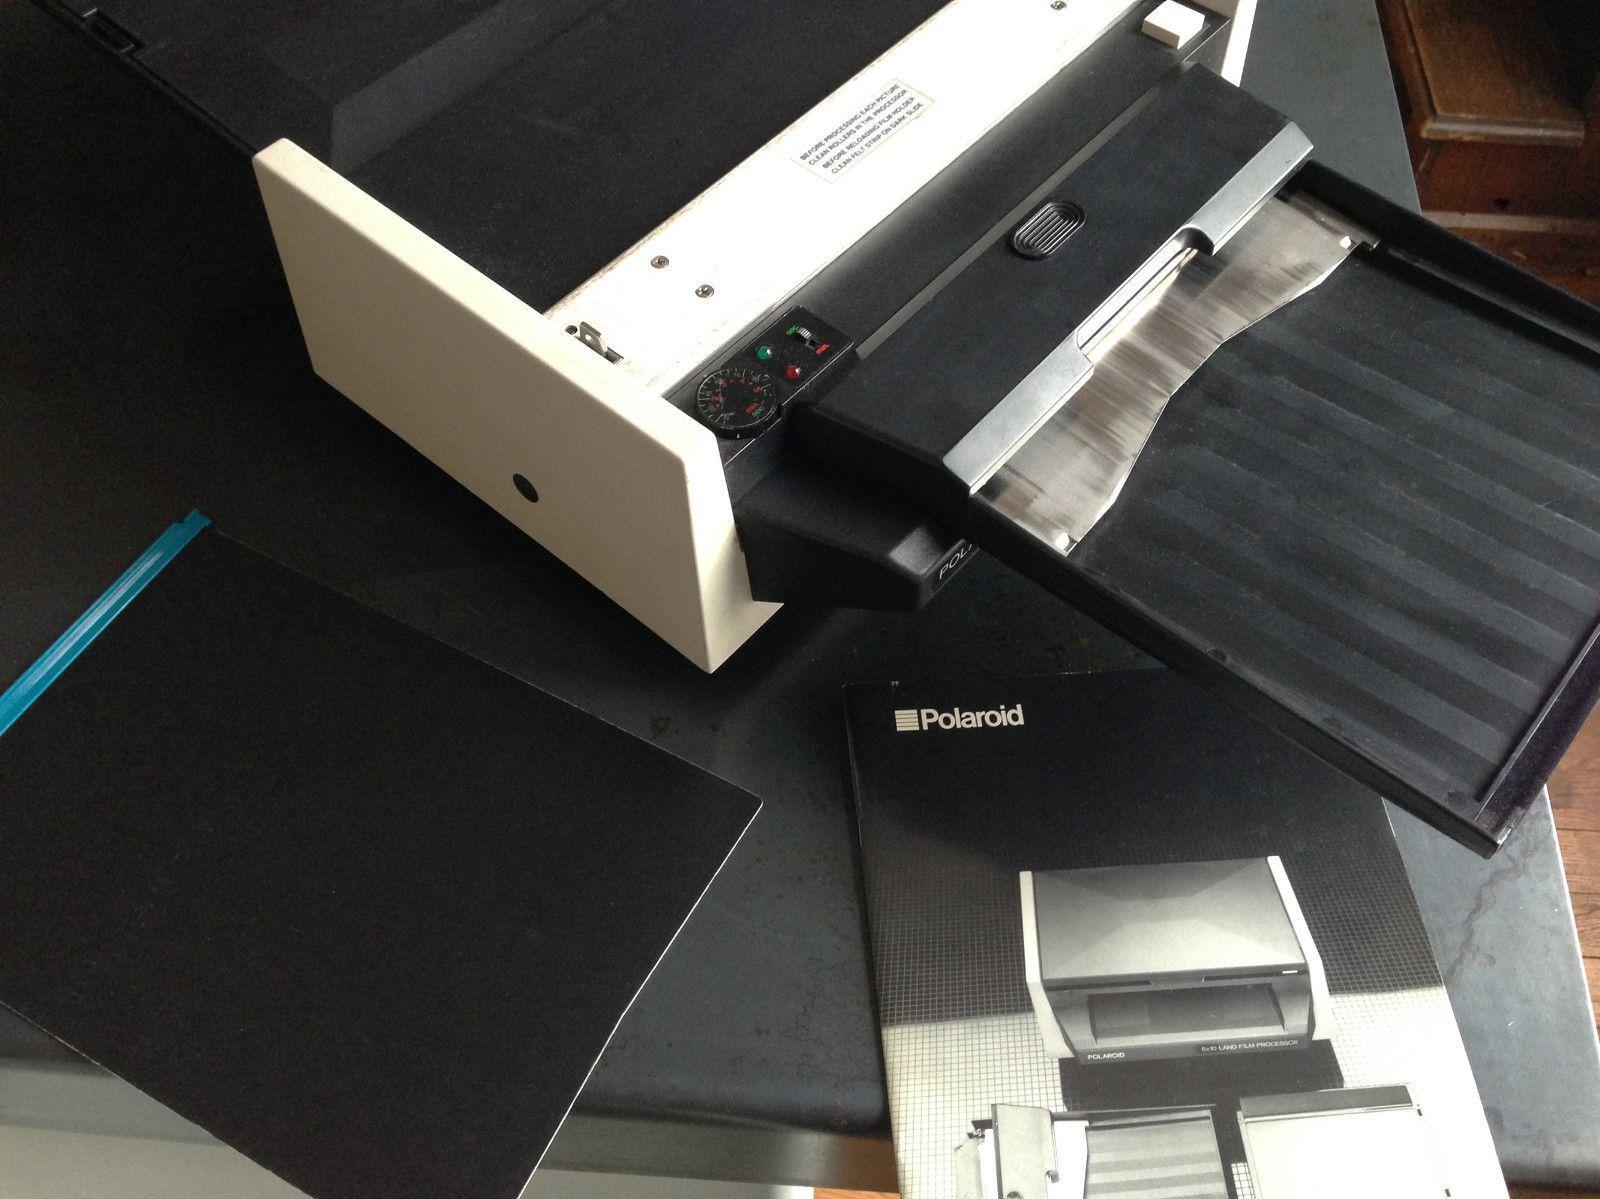 Polaroid 8x10 Land Film Processor Loading Tray 81 09 Dark Slide